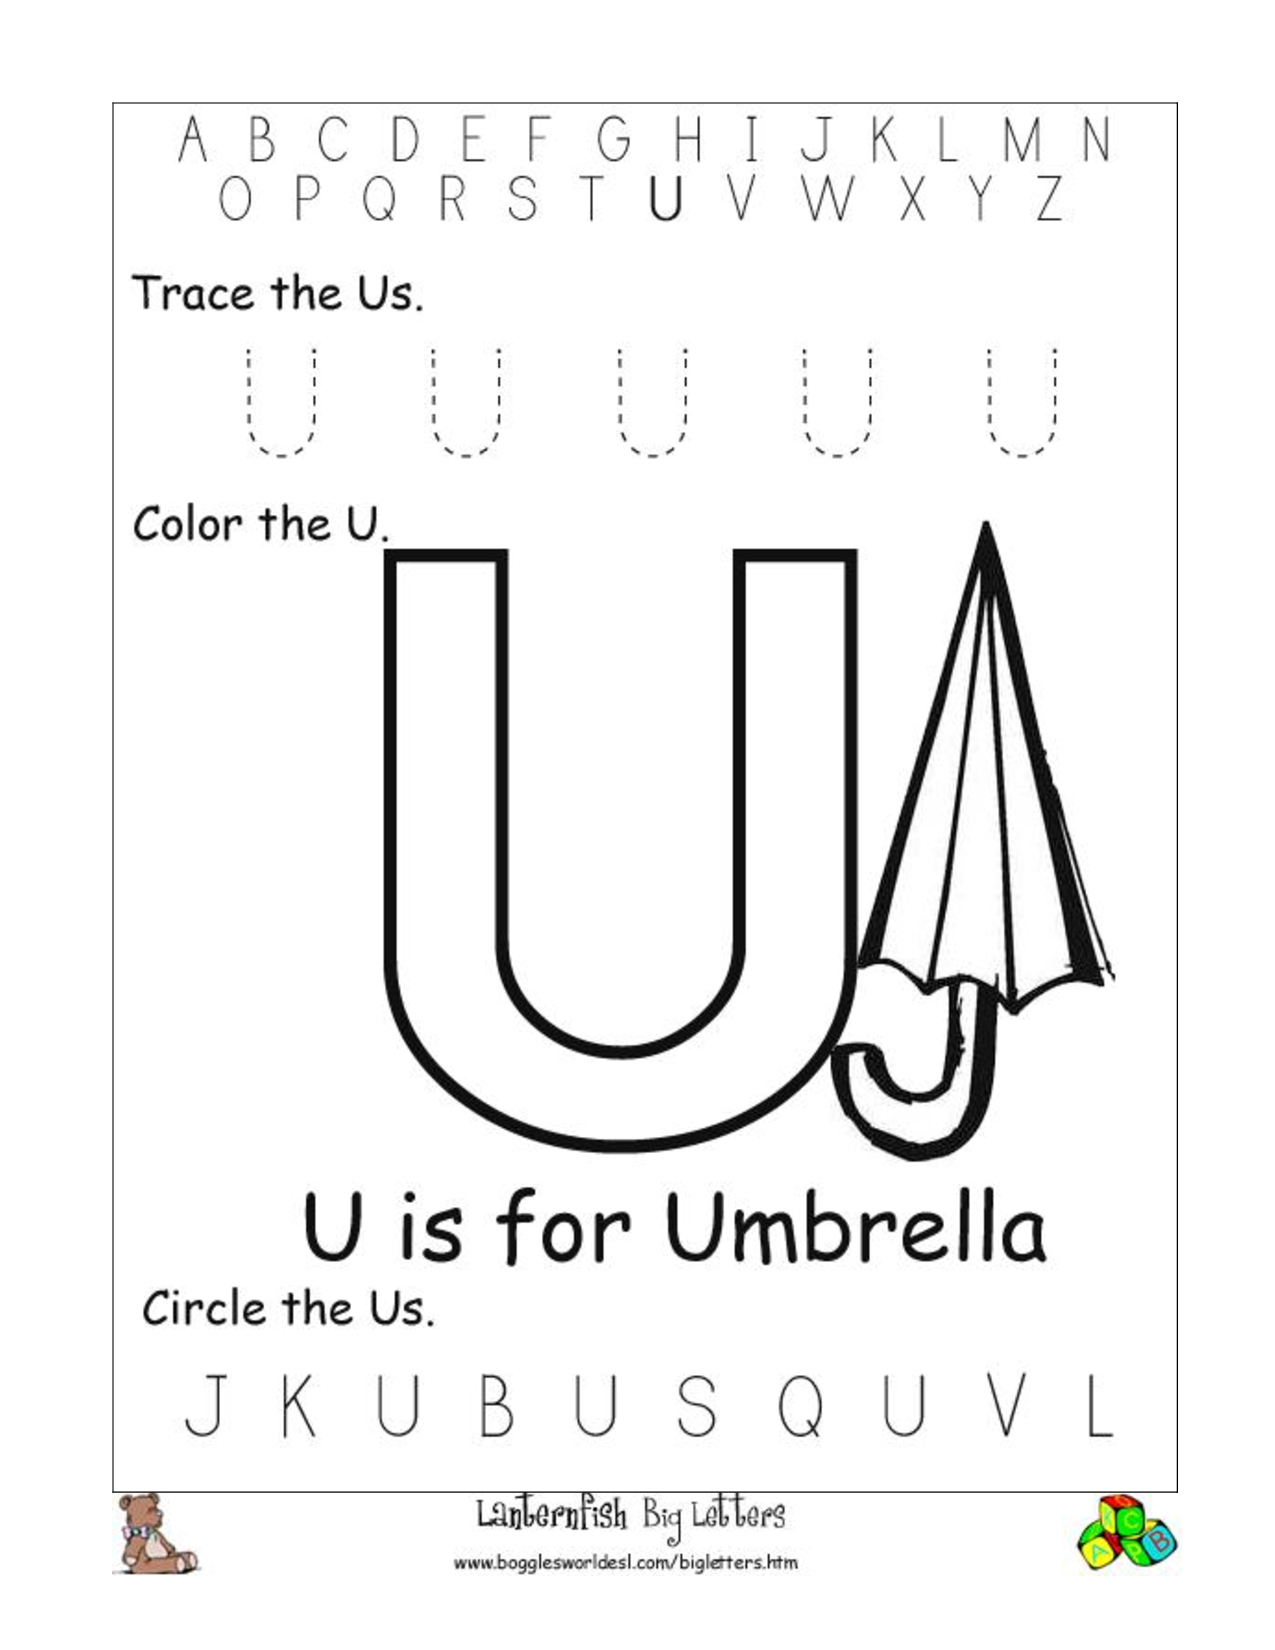 Alphabet Worksheets For Preschoolers | Alphabet Worksheet regarding Alphabet Tracing Doc